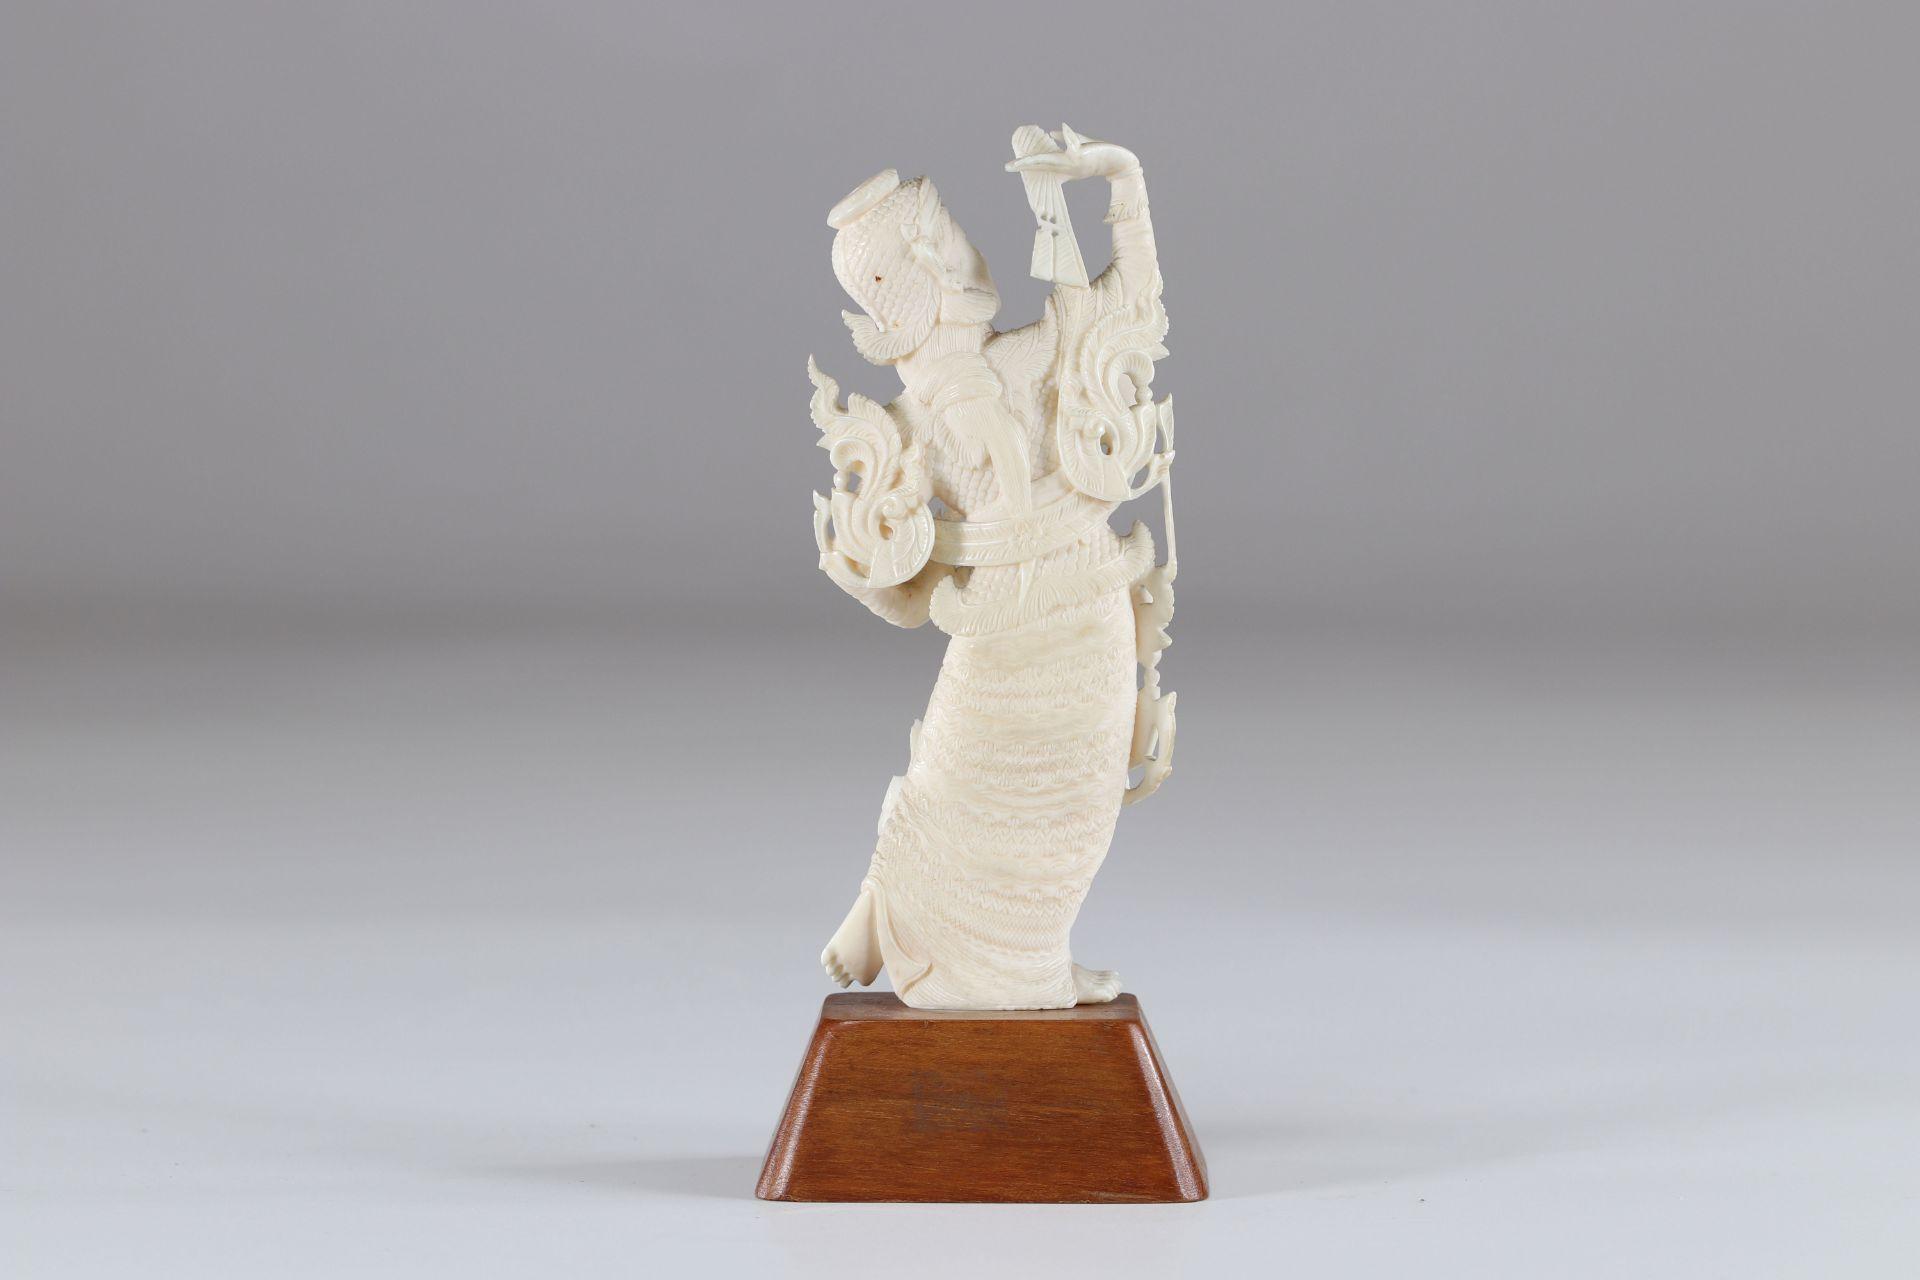 Ivory thai dancer - Image 2 of 2